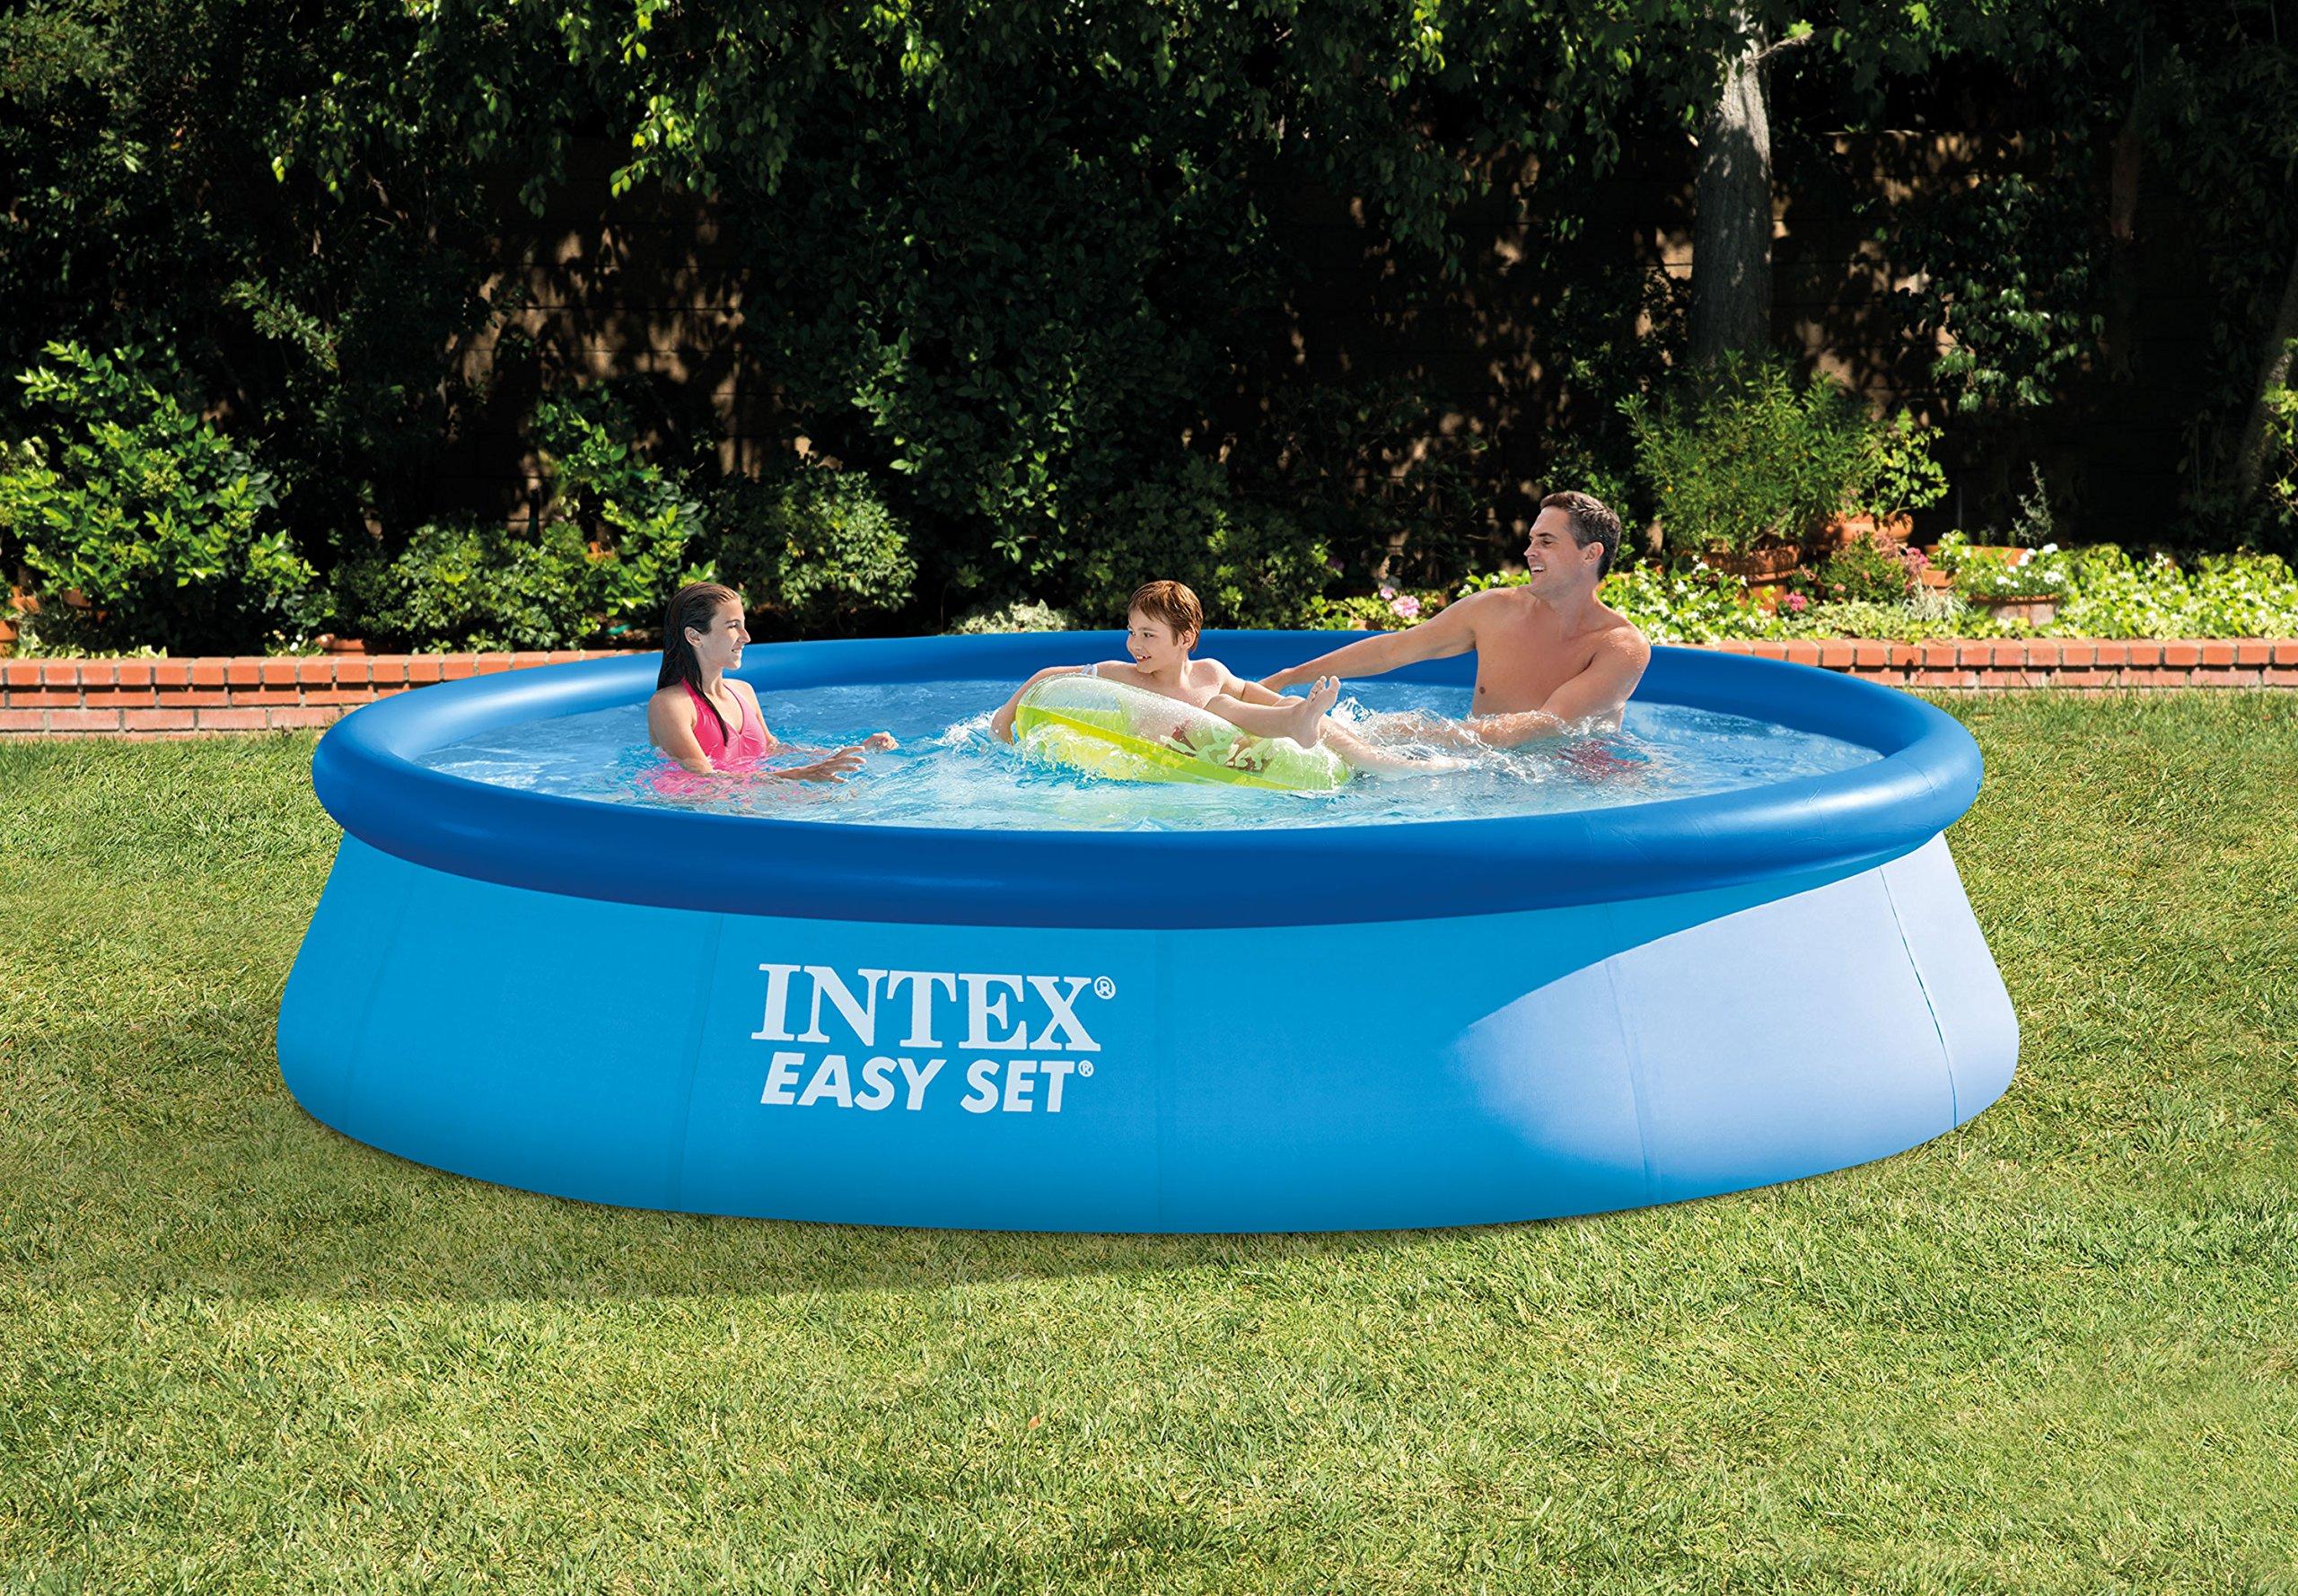 Intex Recreation 28143EH 13'x33 Easy Set Pool Set Toy by Intex (Image #4)